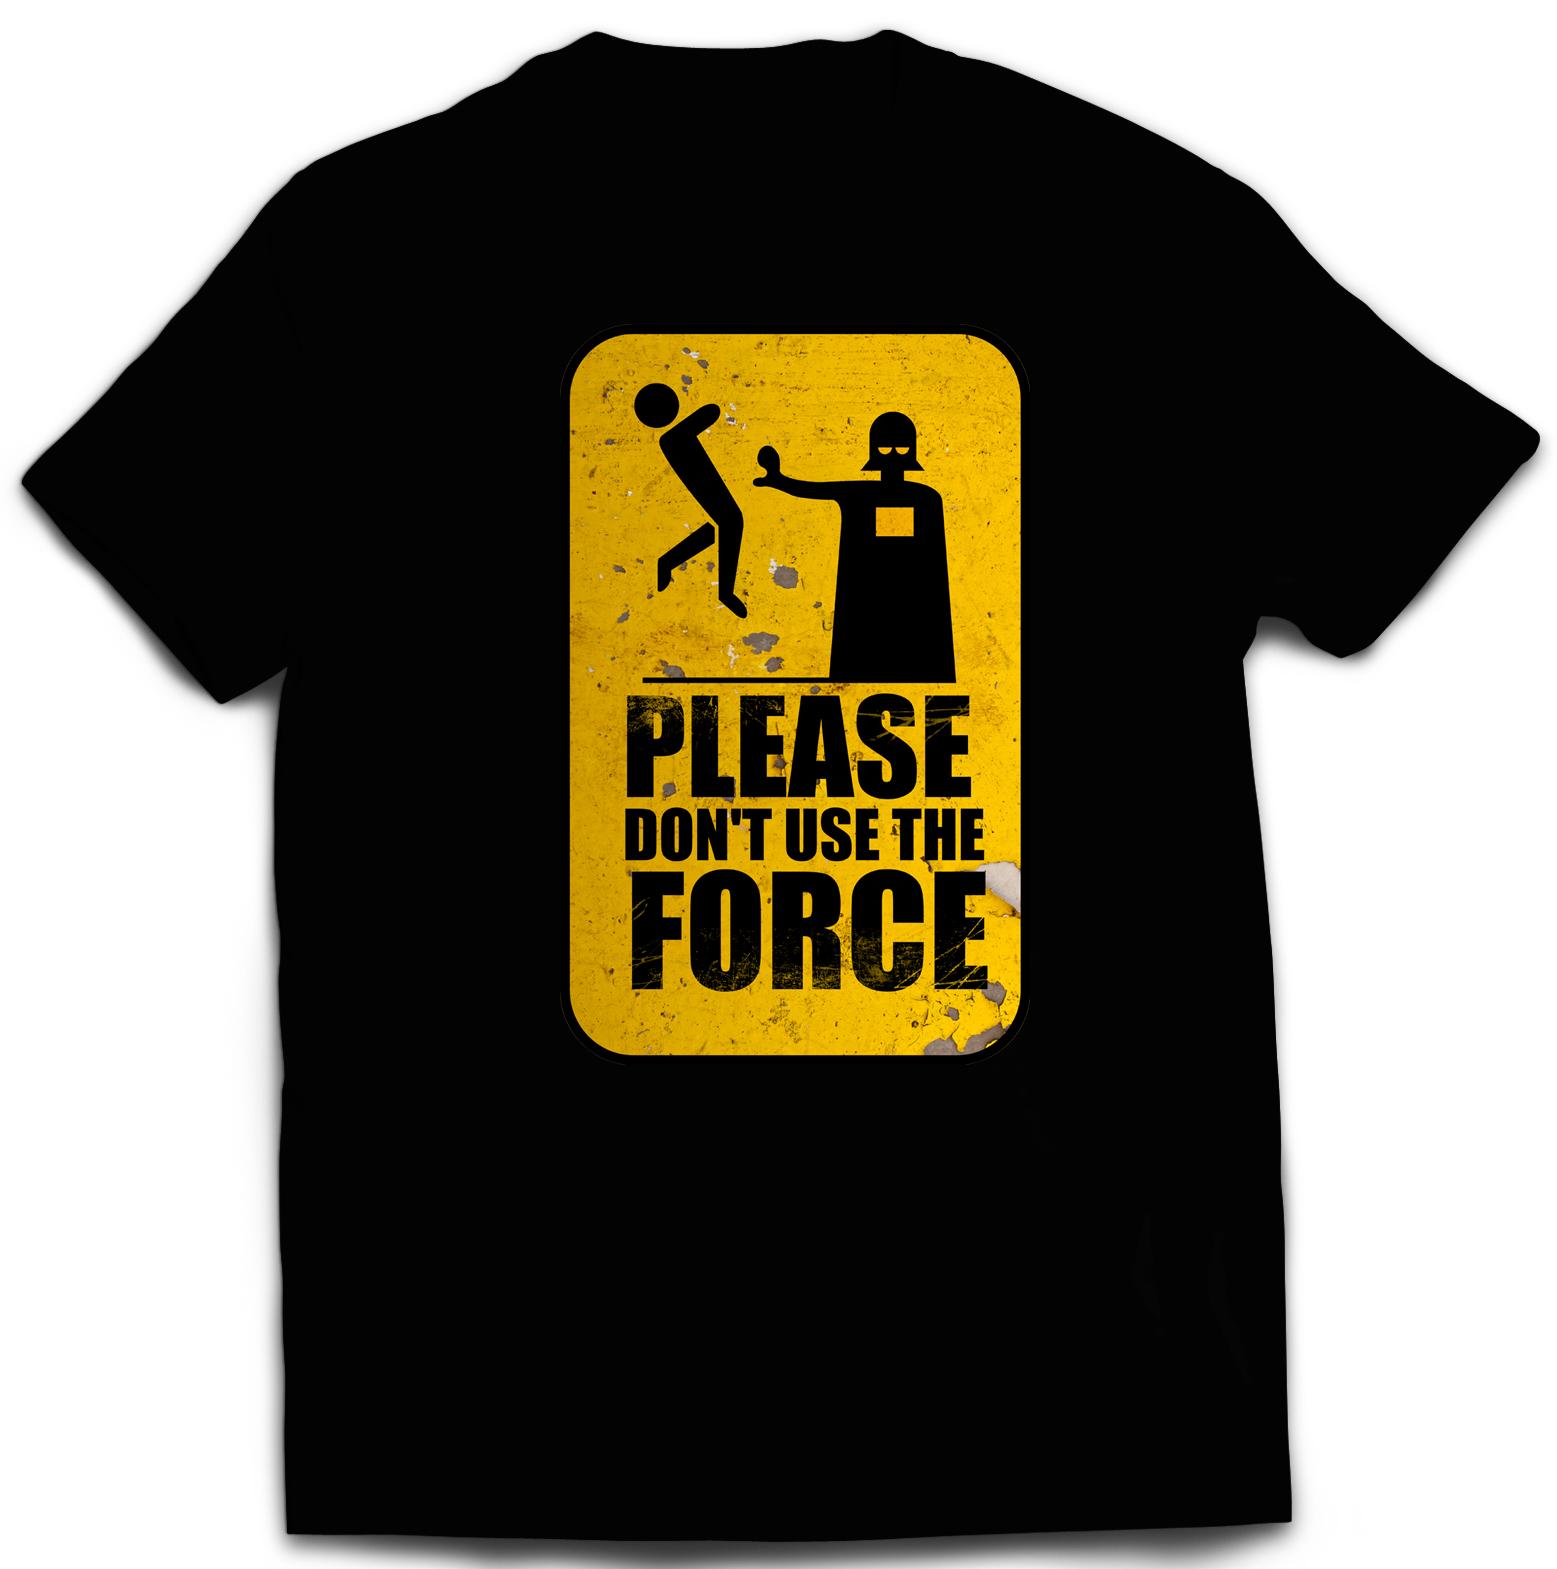 t shirt star wars please don 39 t use the force v2 homme j 39 imprime comme j 39 aime. Black Bedroom Furniture Sets. Home Design Ideas